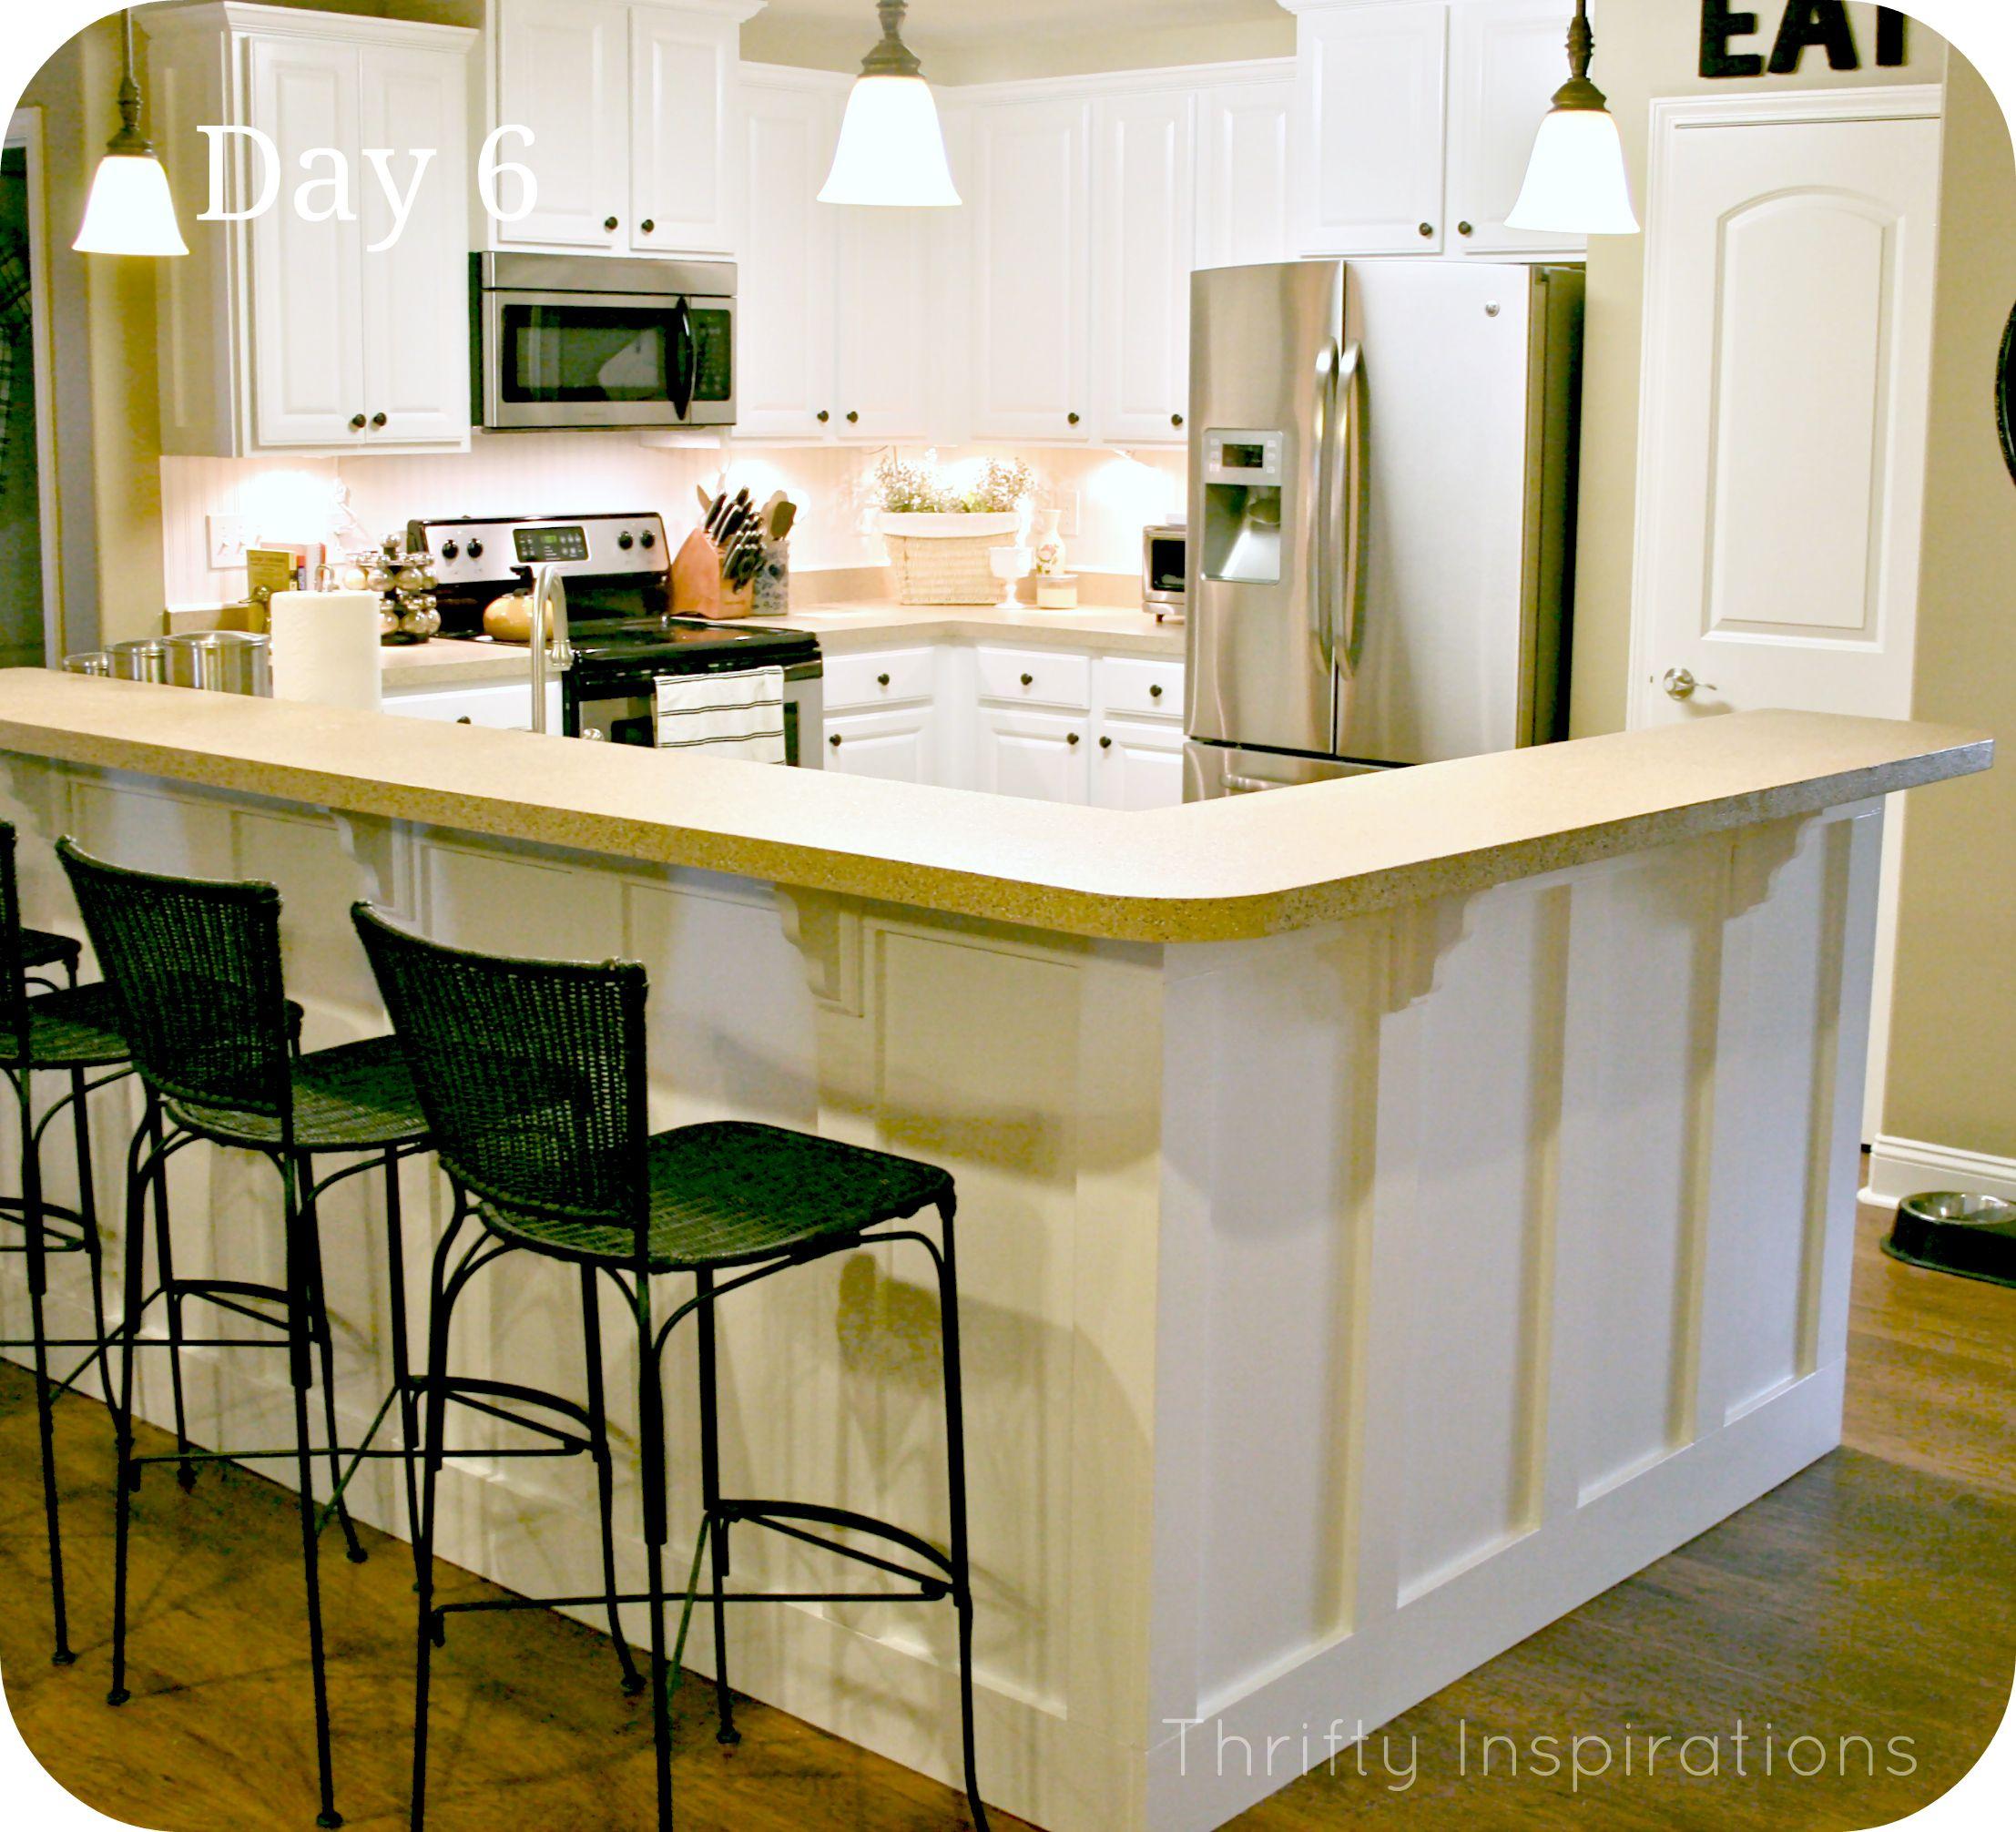 molding under kitchen bar - http://www.thriftyinspirations.net/2012 ...